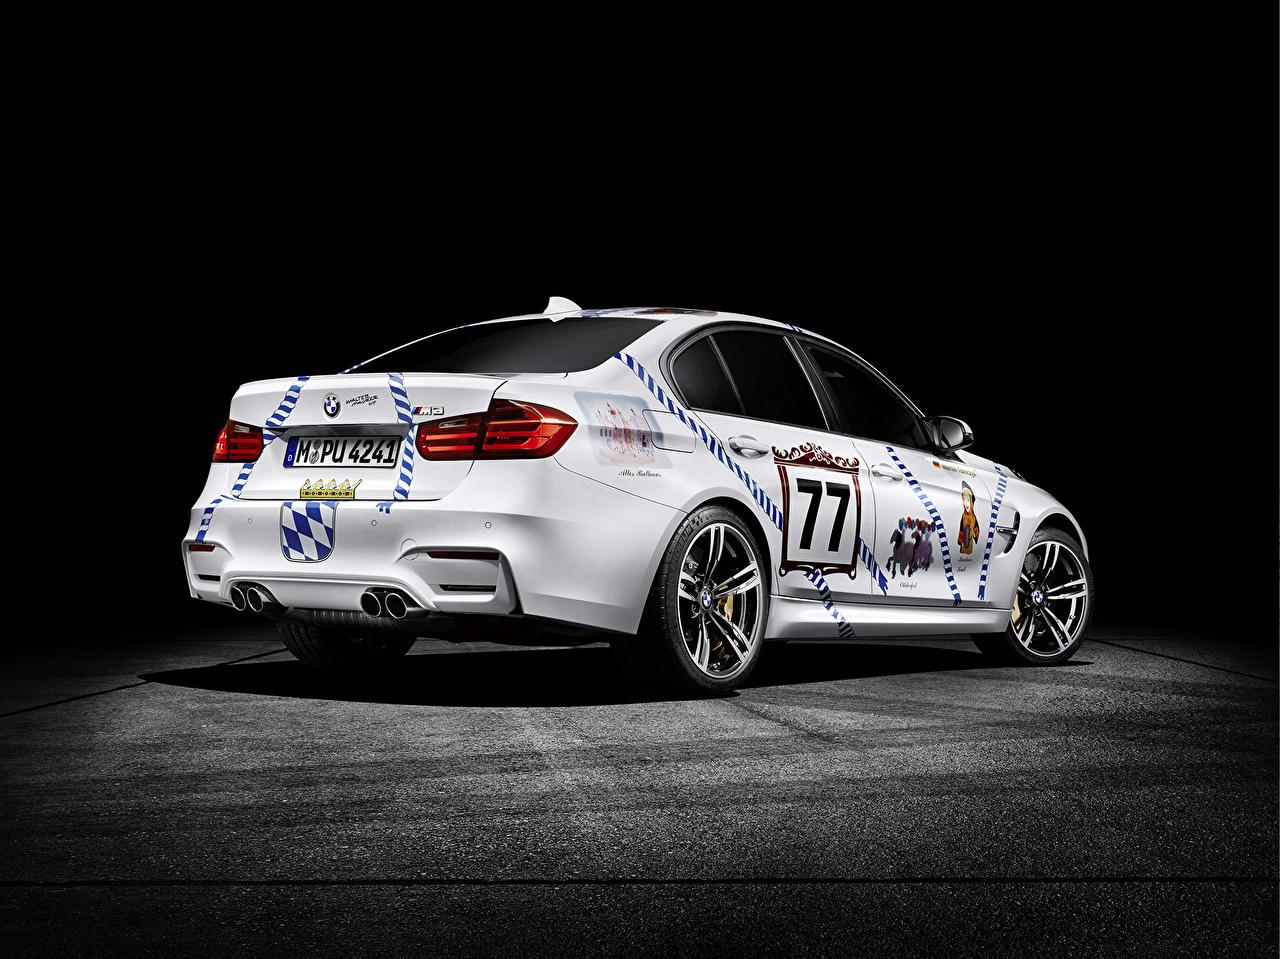 Wallpaper BMW 2015 M3 3-Series F80 White auto Back view Cars automobile